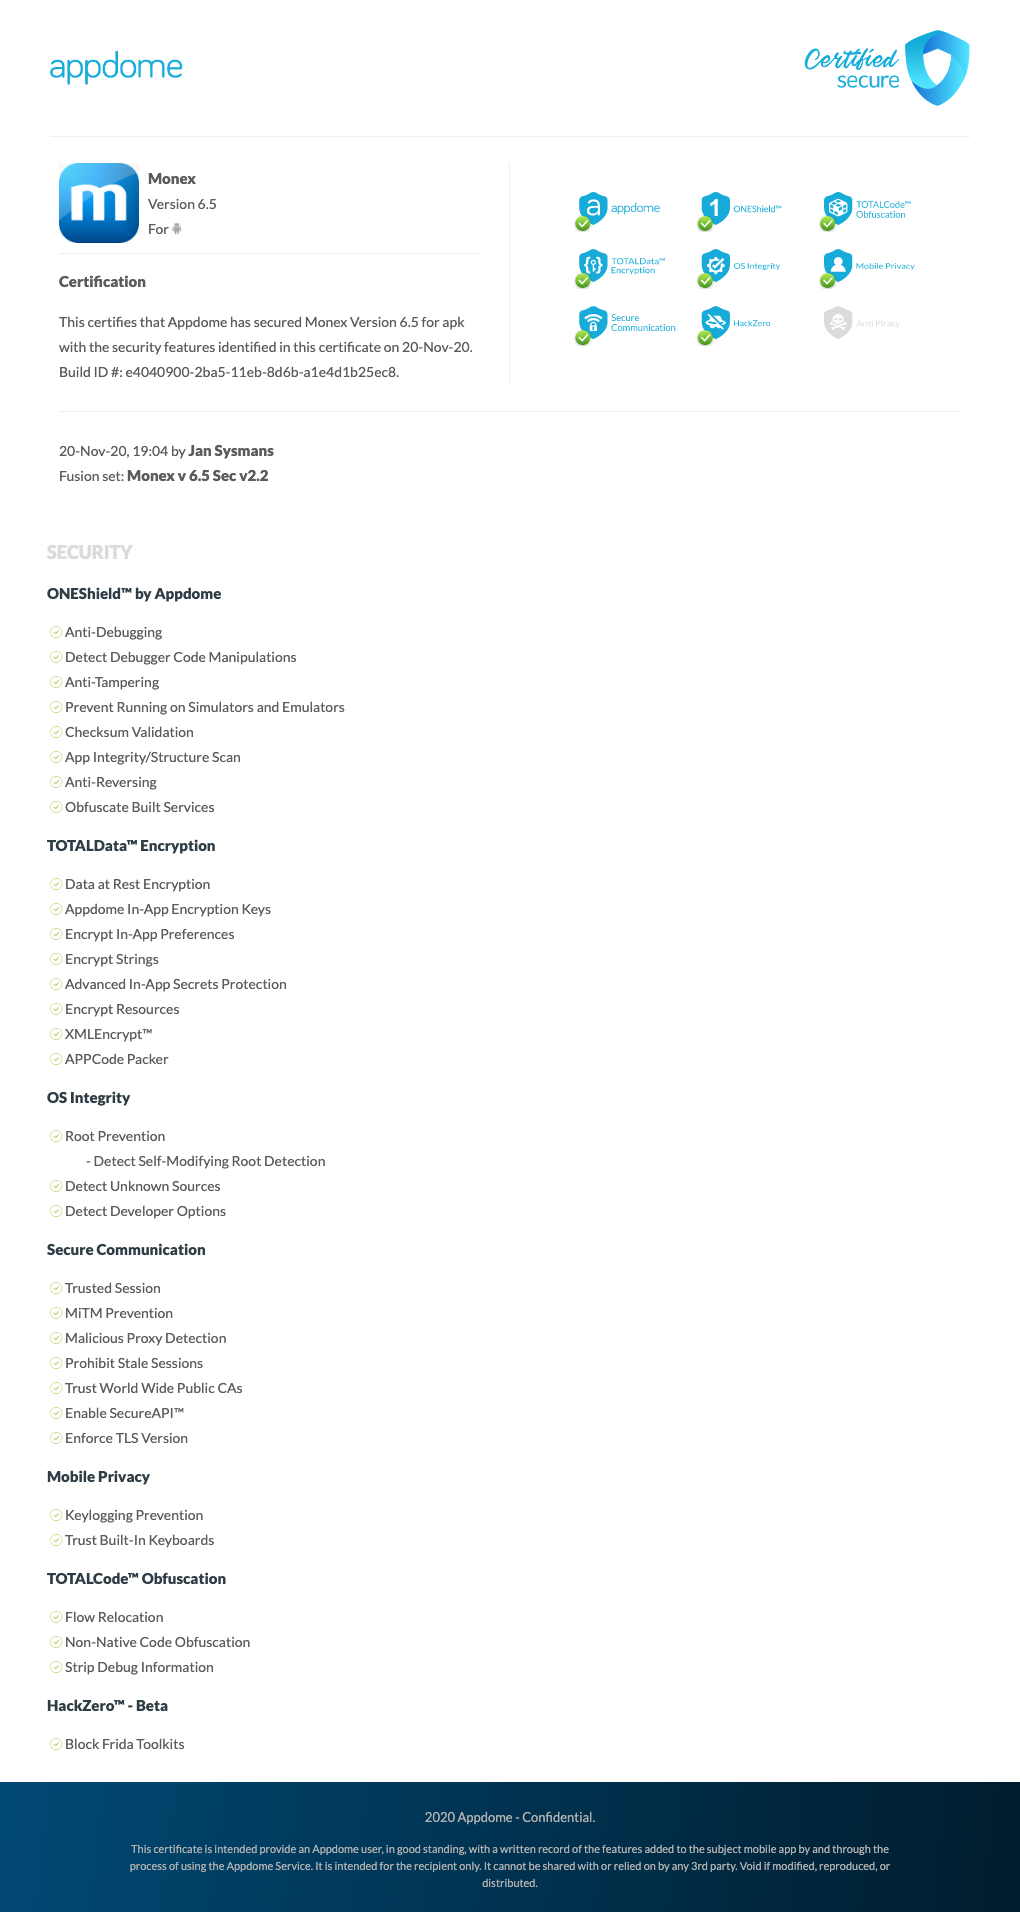 Appdome-Certified-Secure-Certificate-Monex